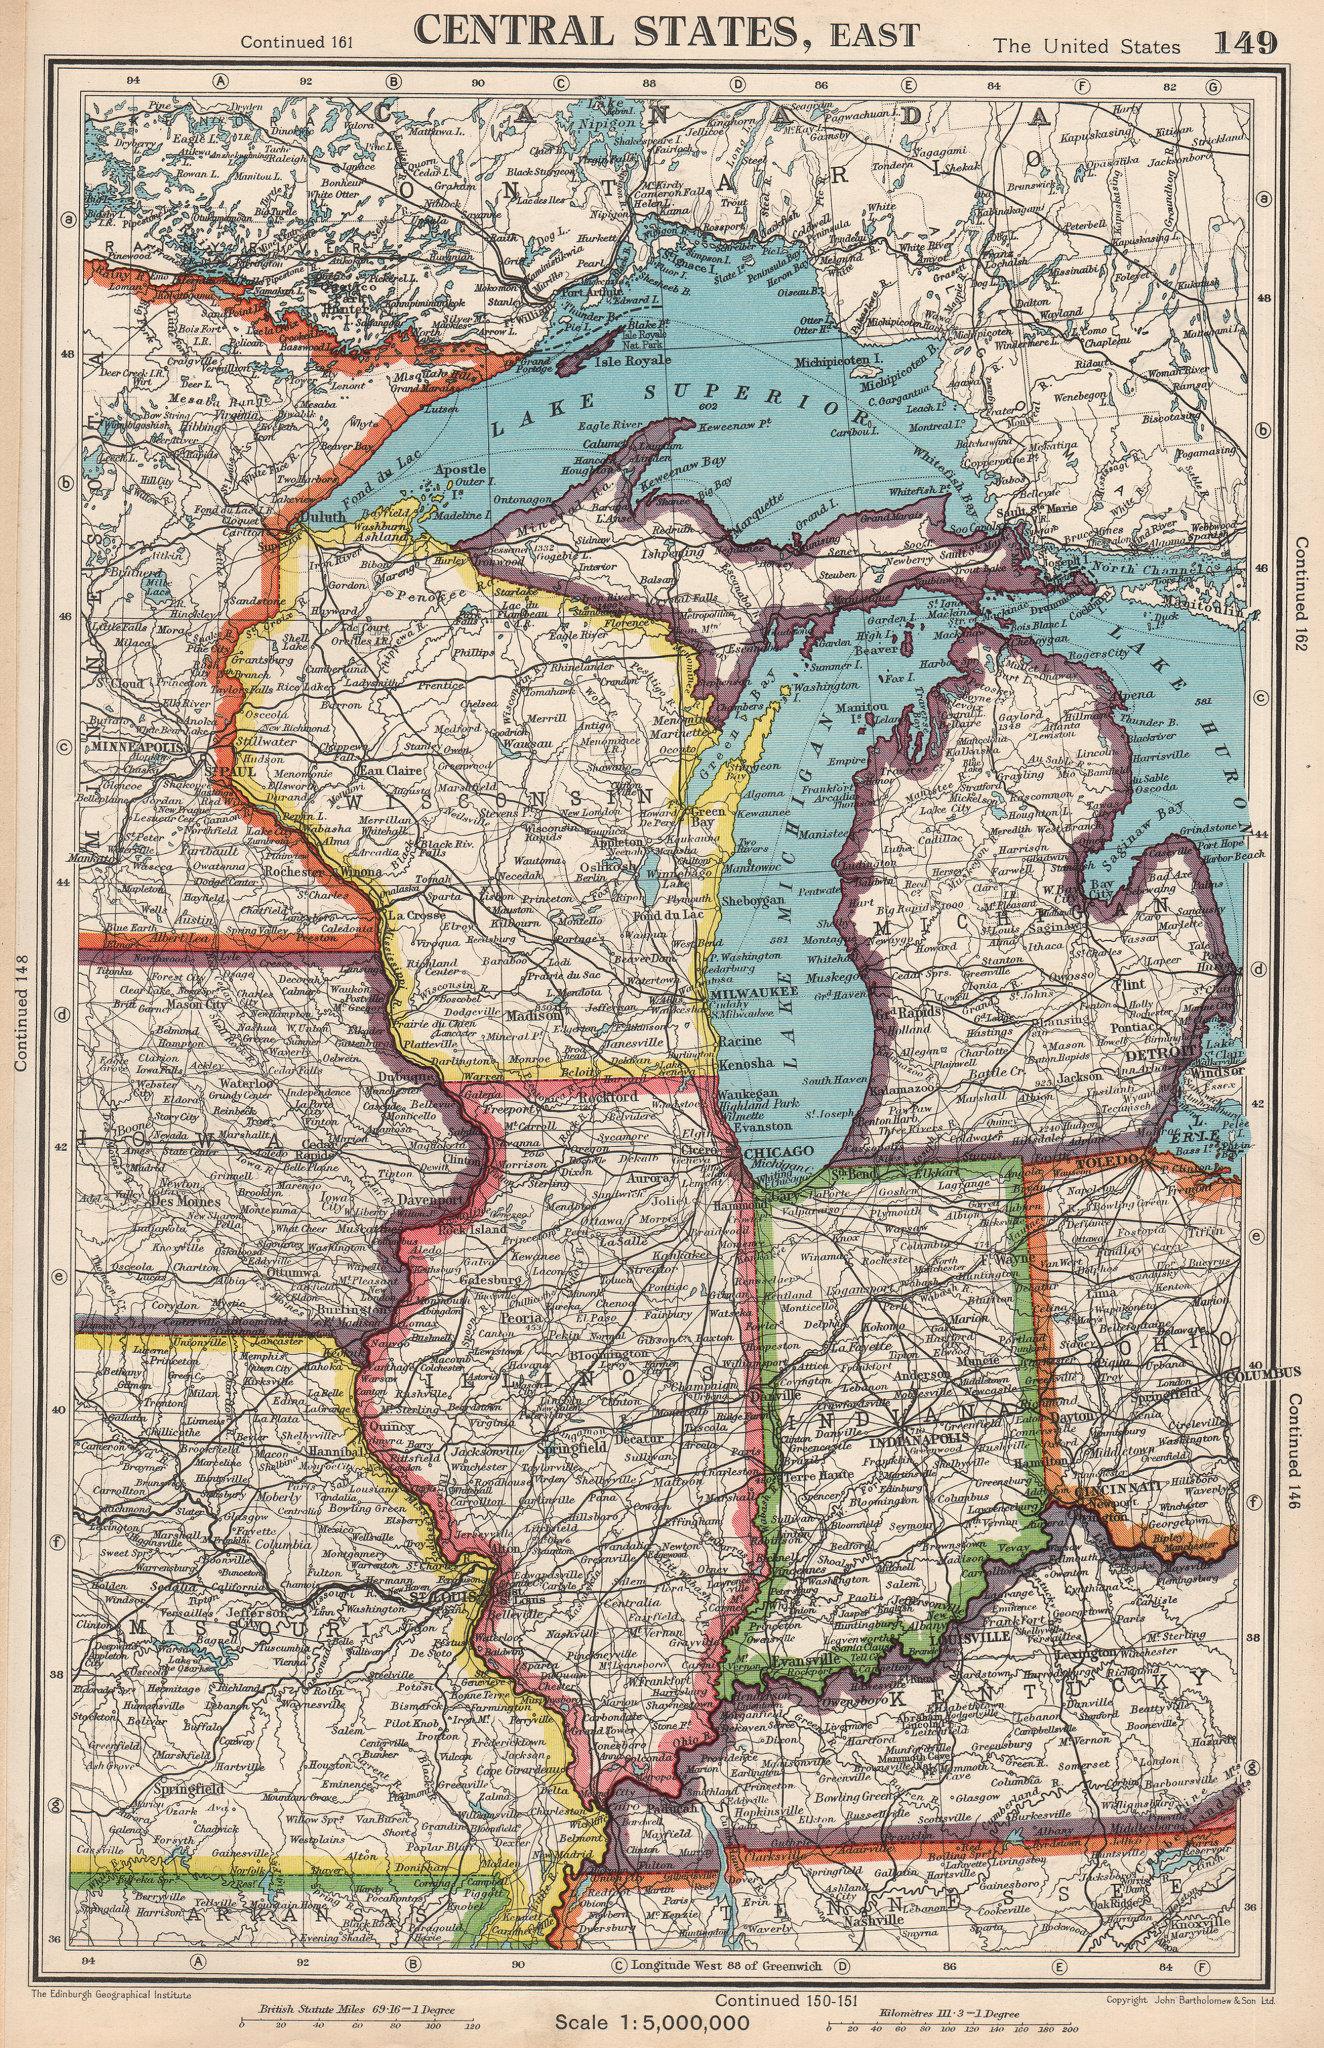 Associate Product MIDWEST USA. WI Michigan Illinois Indiana. Great Lakes. BARTHOLOMEW 1952 map